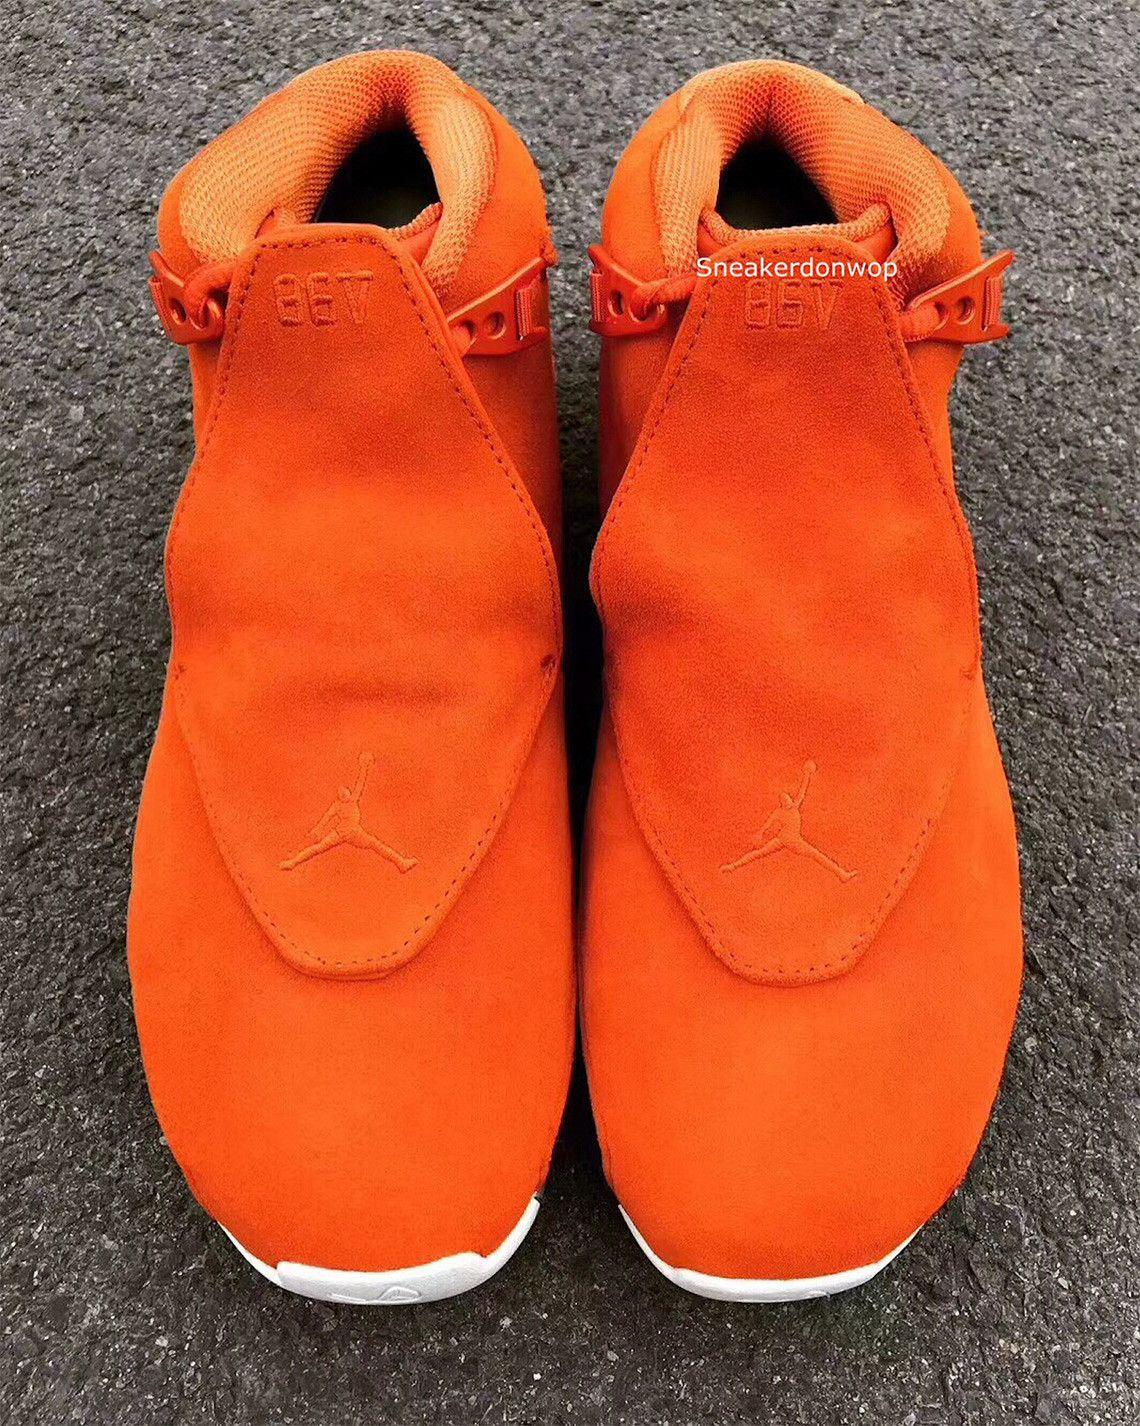 promo code ecefe 8ee2d Jordan Brand To Release An Orange Air Jordan 18 Retro This Year